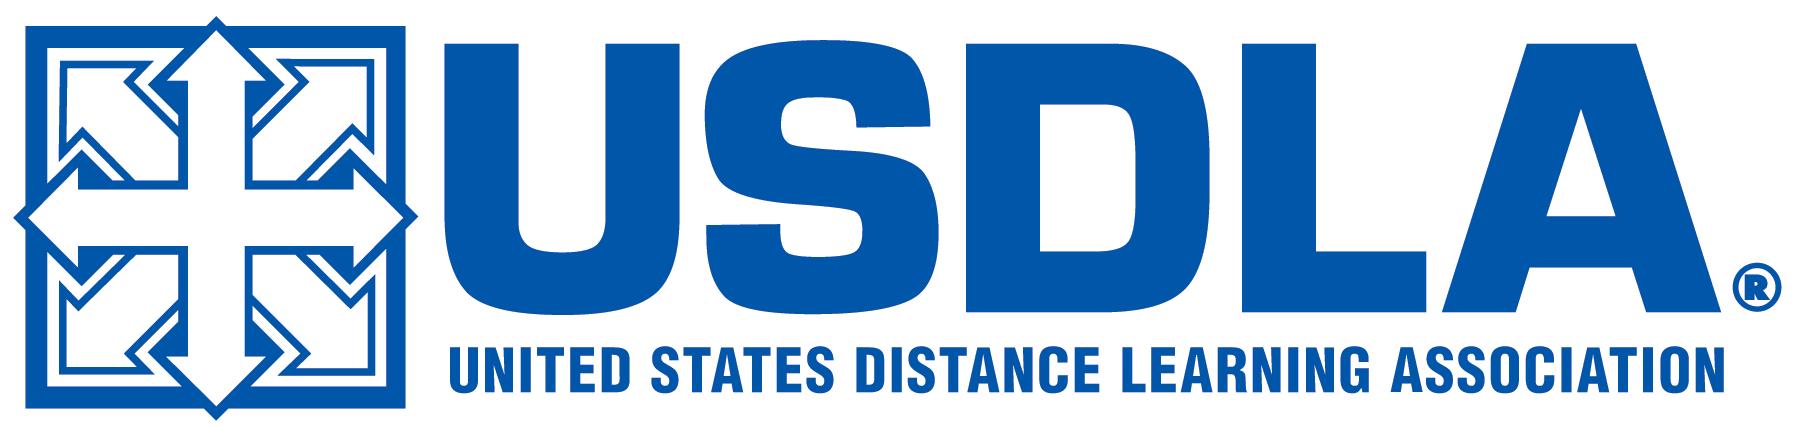 USDLA - Broadband Inequities